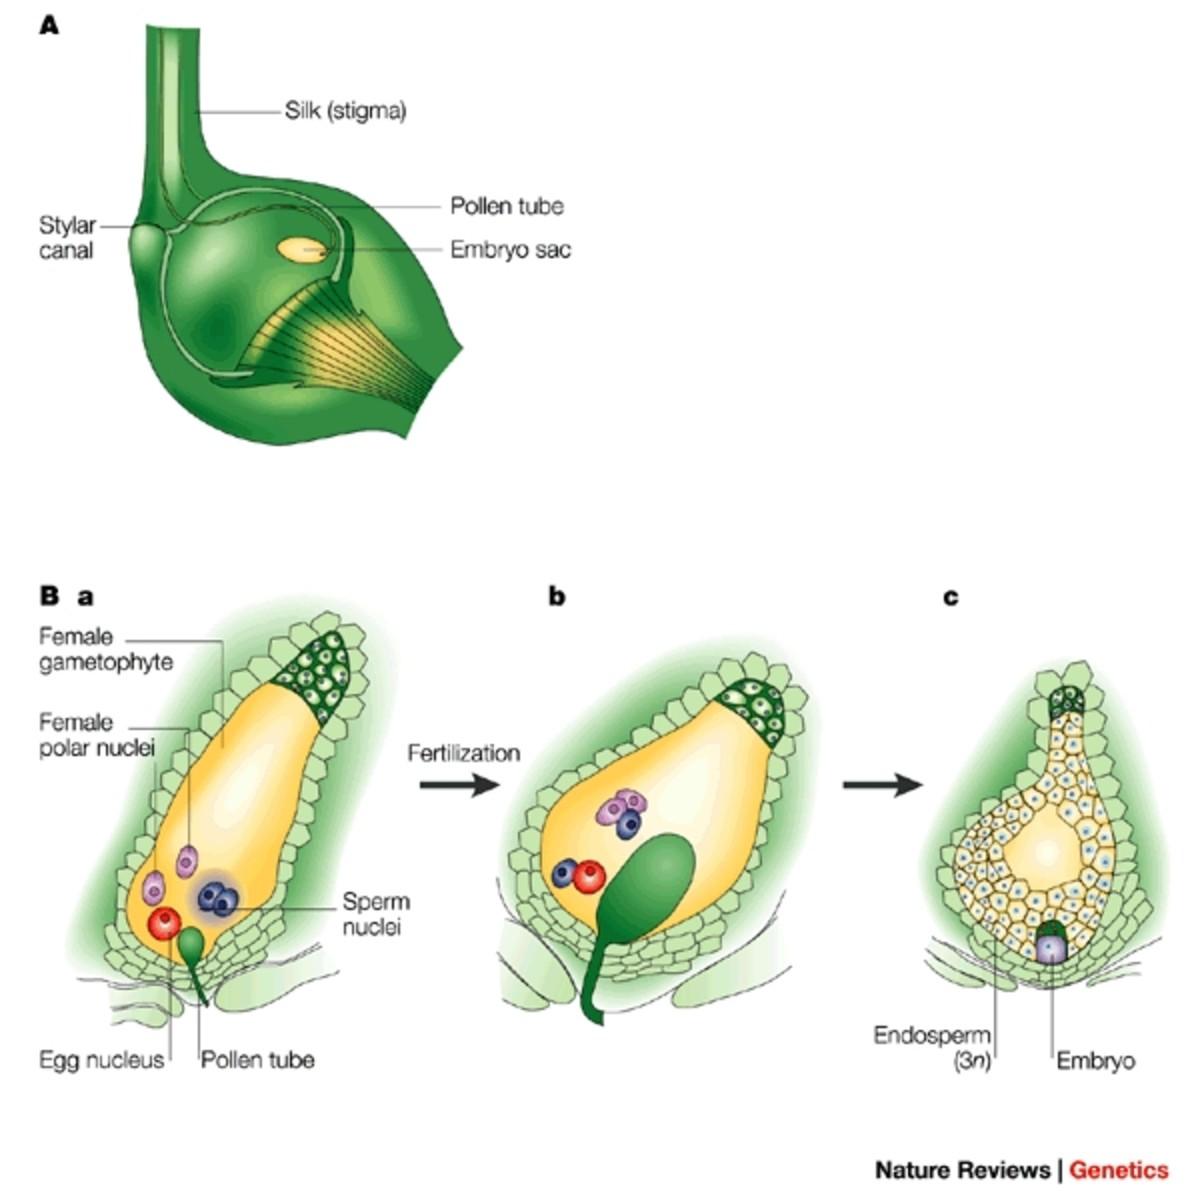 Fertilization in an angiosperm